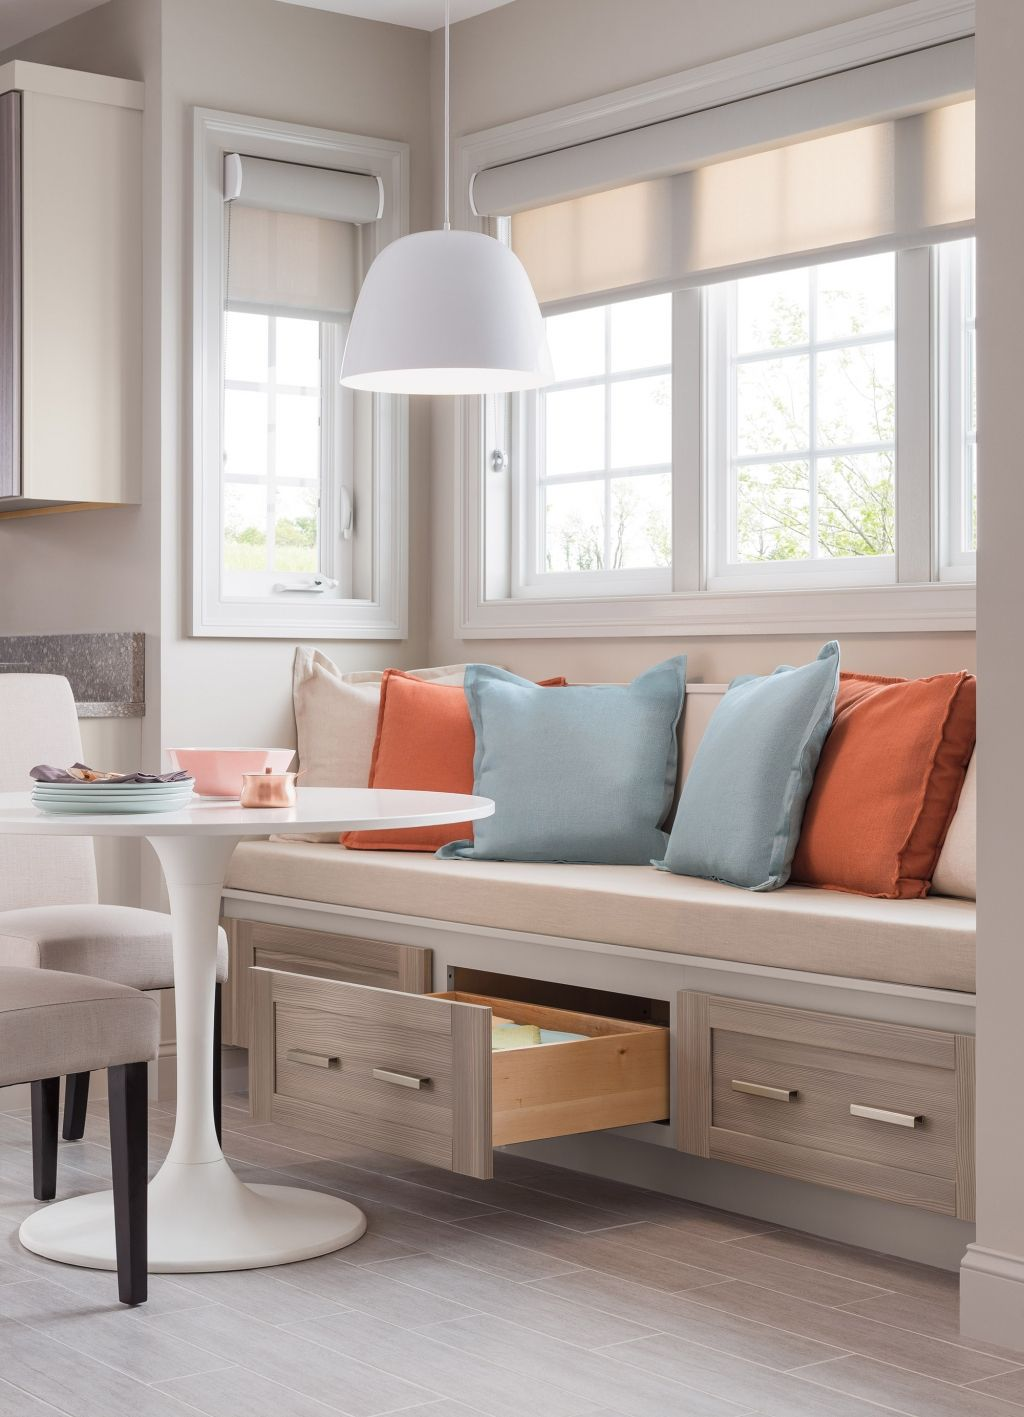 folding tables for sale Inspirational furniture round tables for sale foldable table banquette seating - Trendir